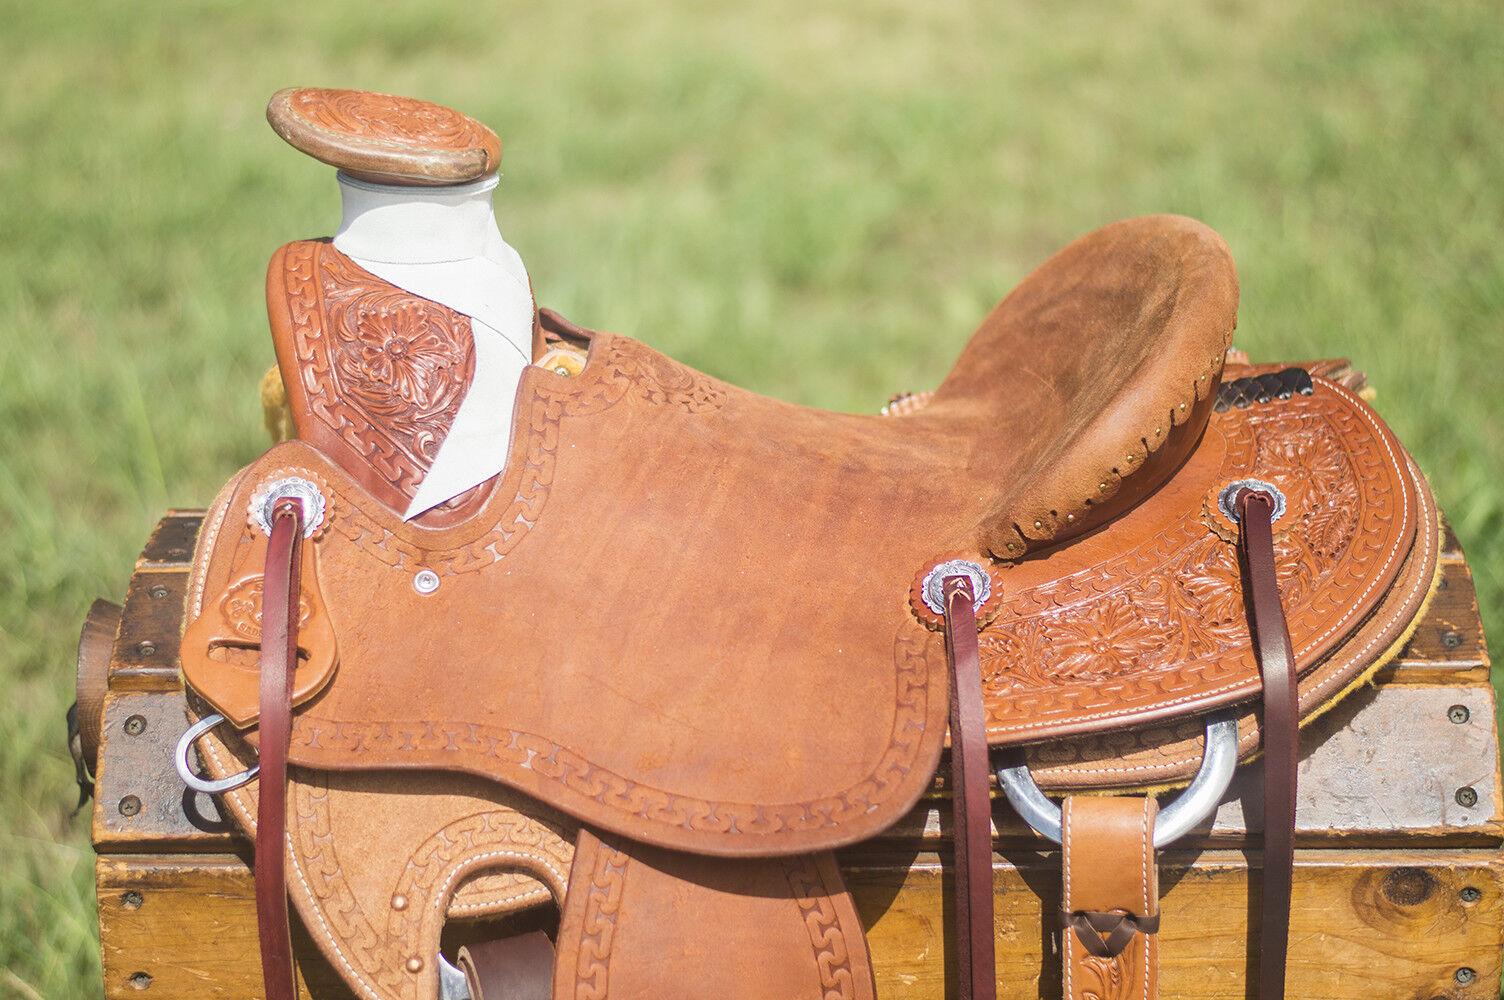 15  Spur  Saddlery Wade Ranch Roping Saddle (Made in Texas)  good price